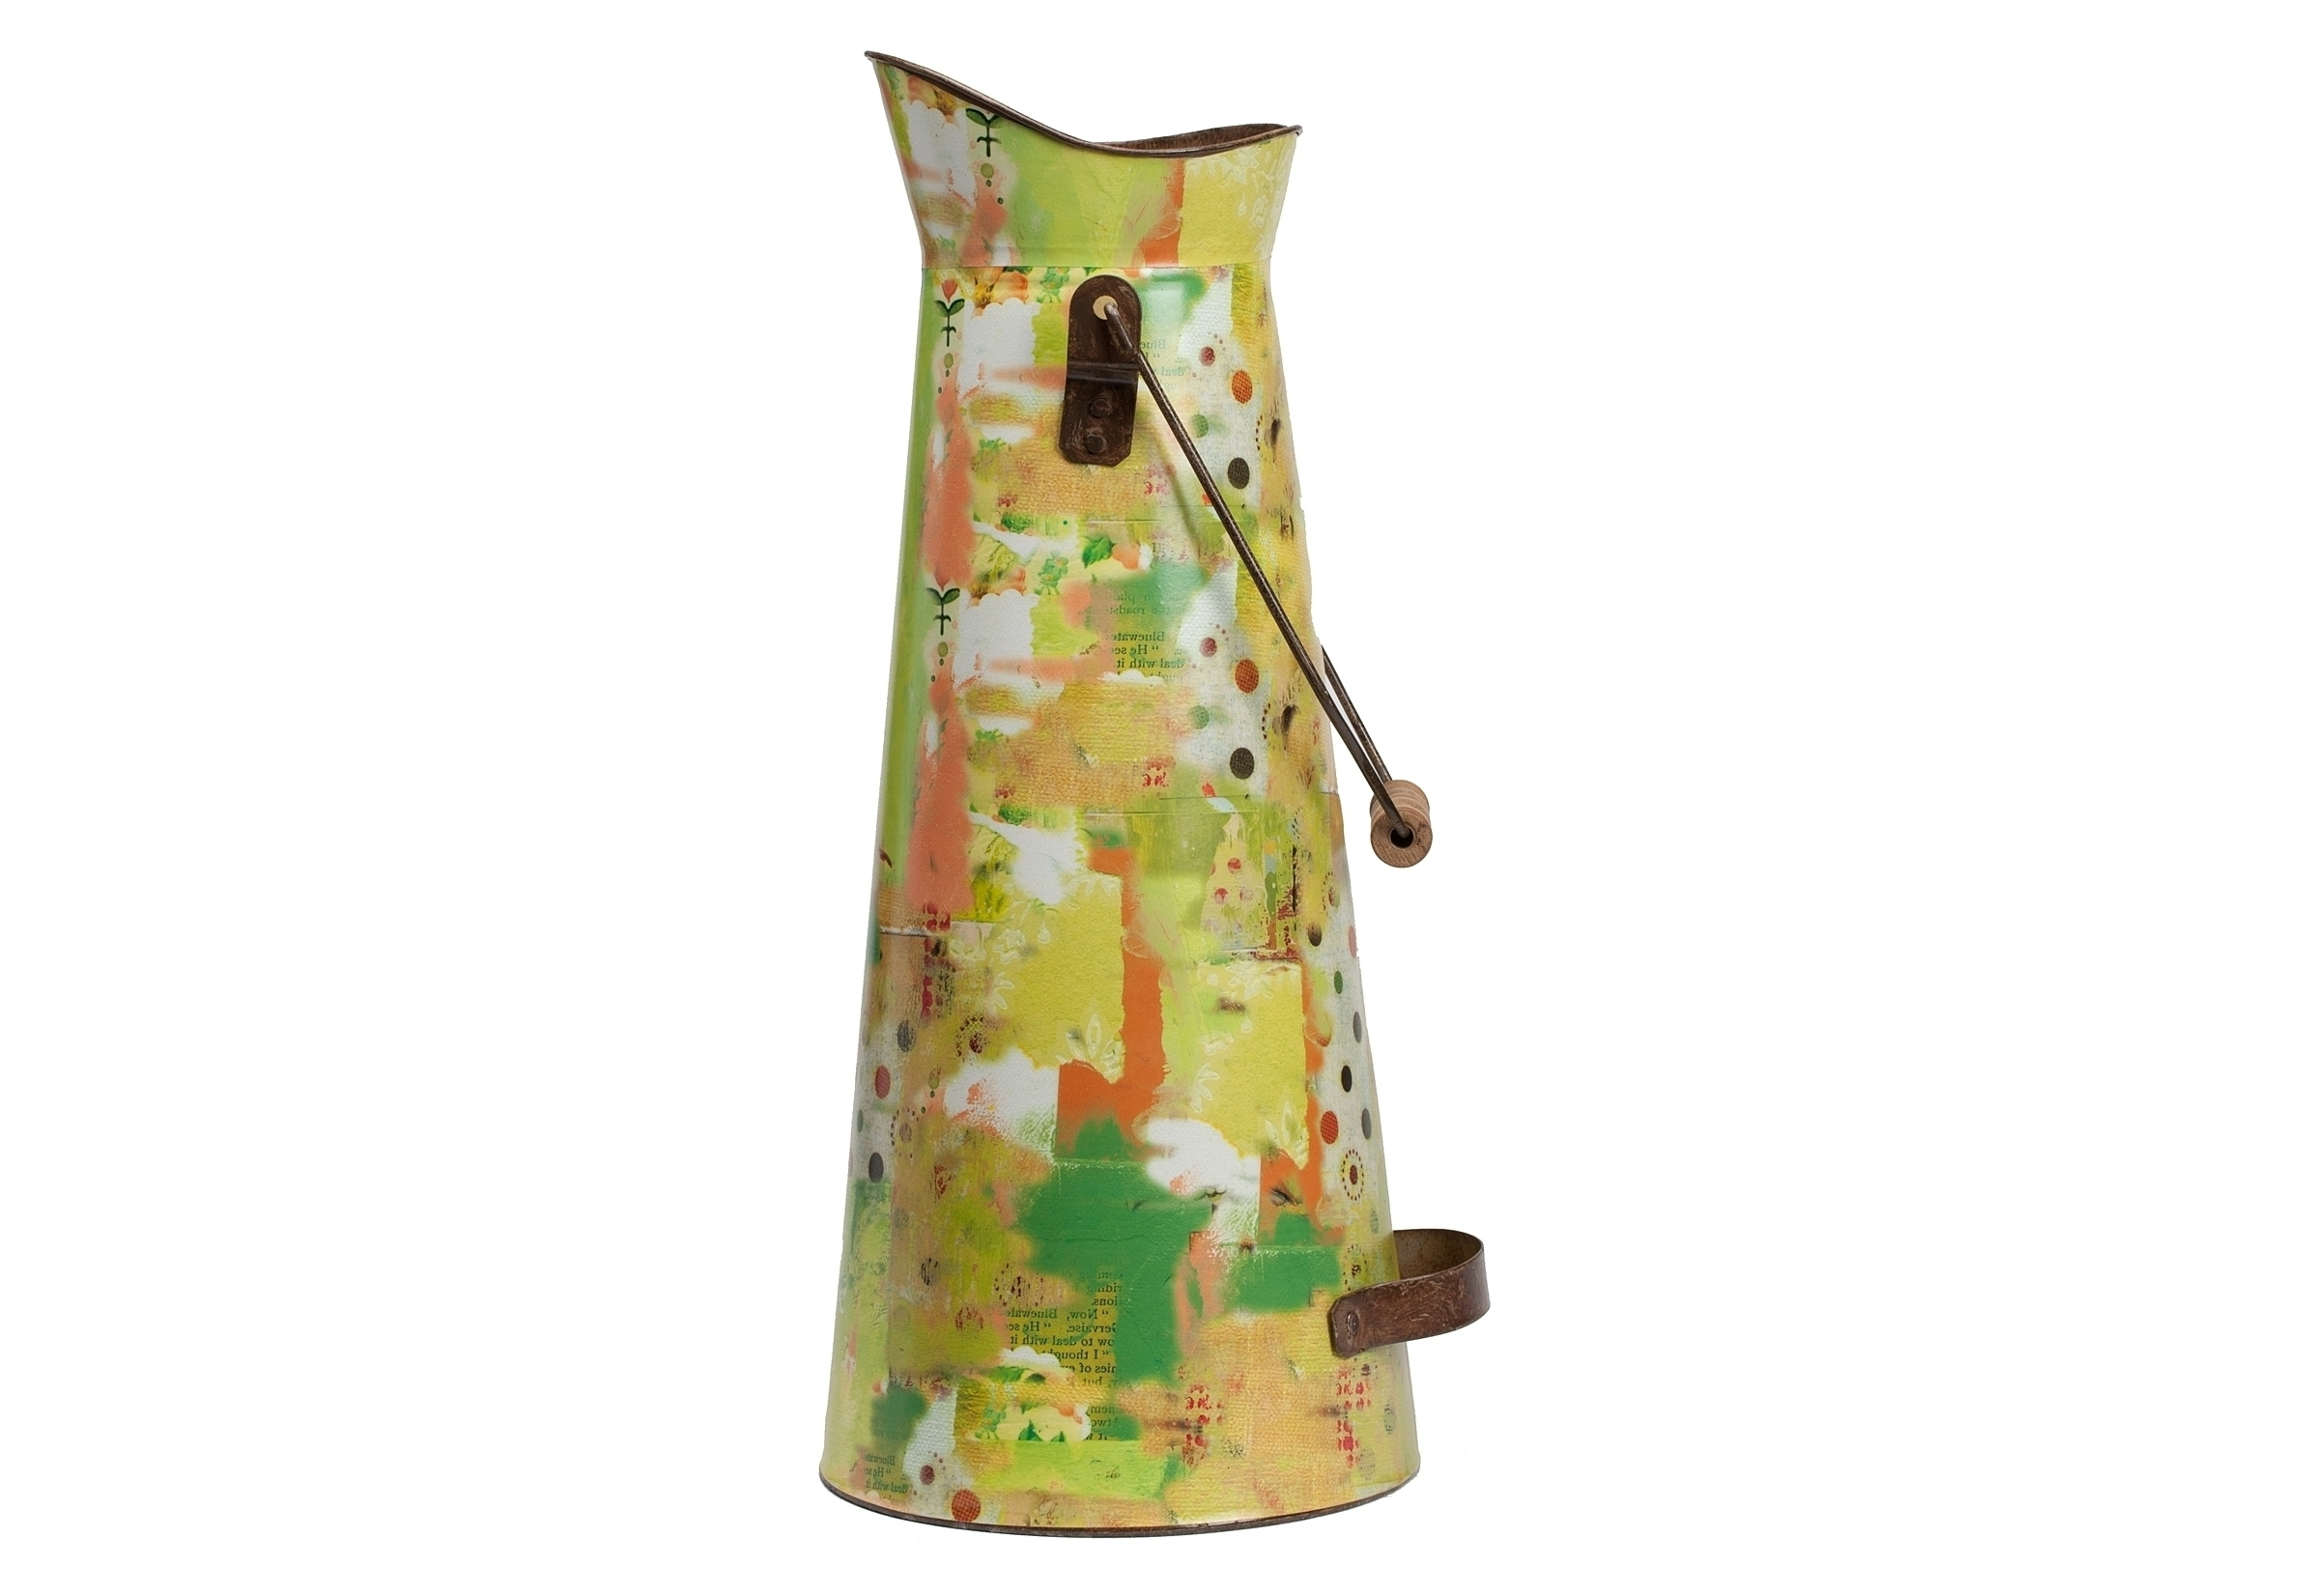 Декоративный кувшин Kelly KimКувшины и графины<br>Объем 3 литра.<br><br>Material: Металл<br>Height см: 43,5<br>Diameter см: 18,5